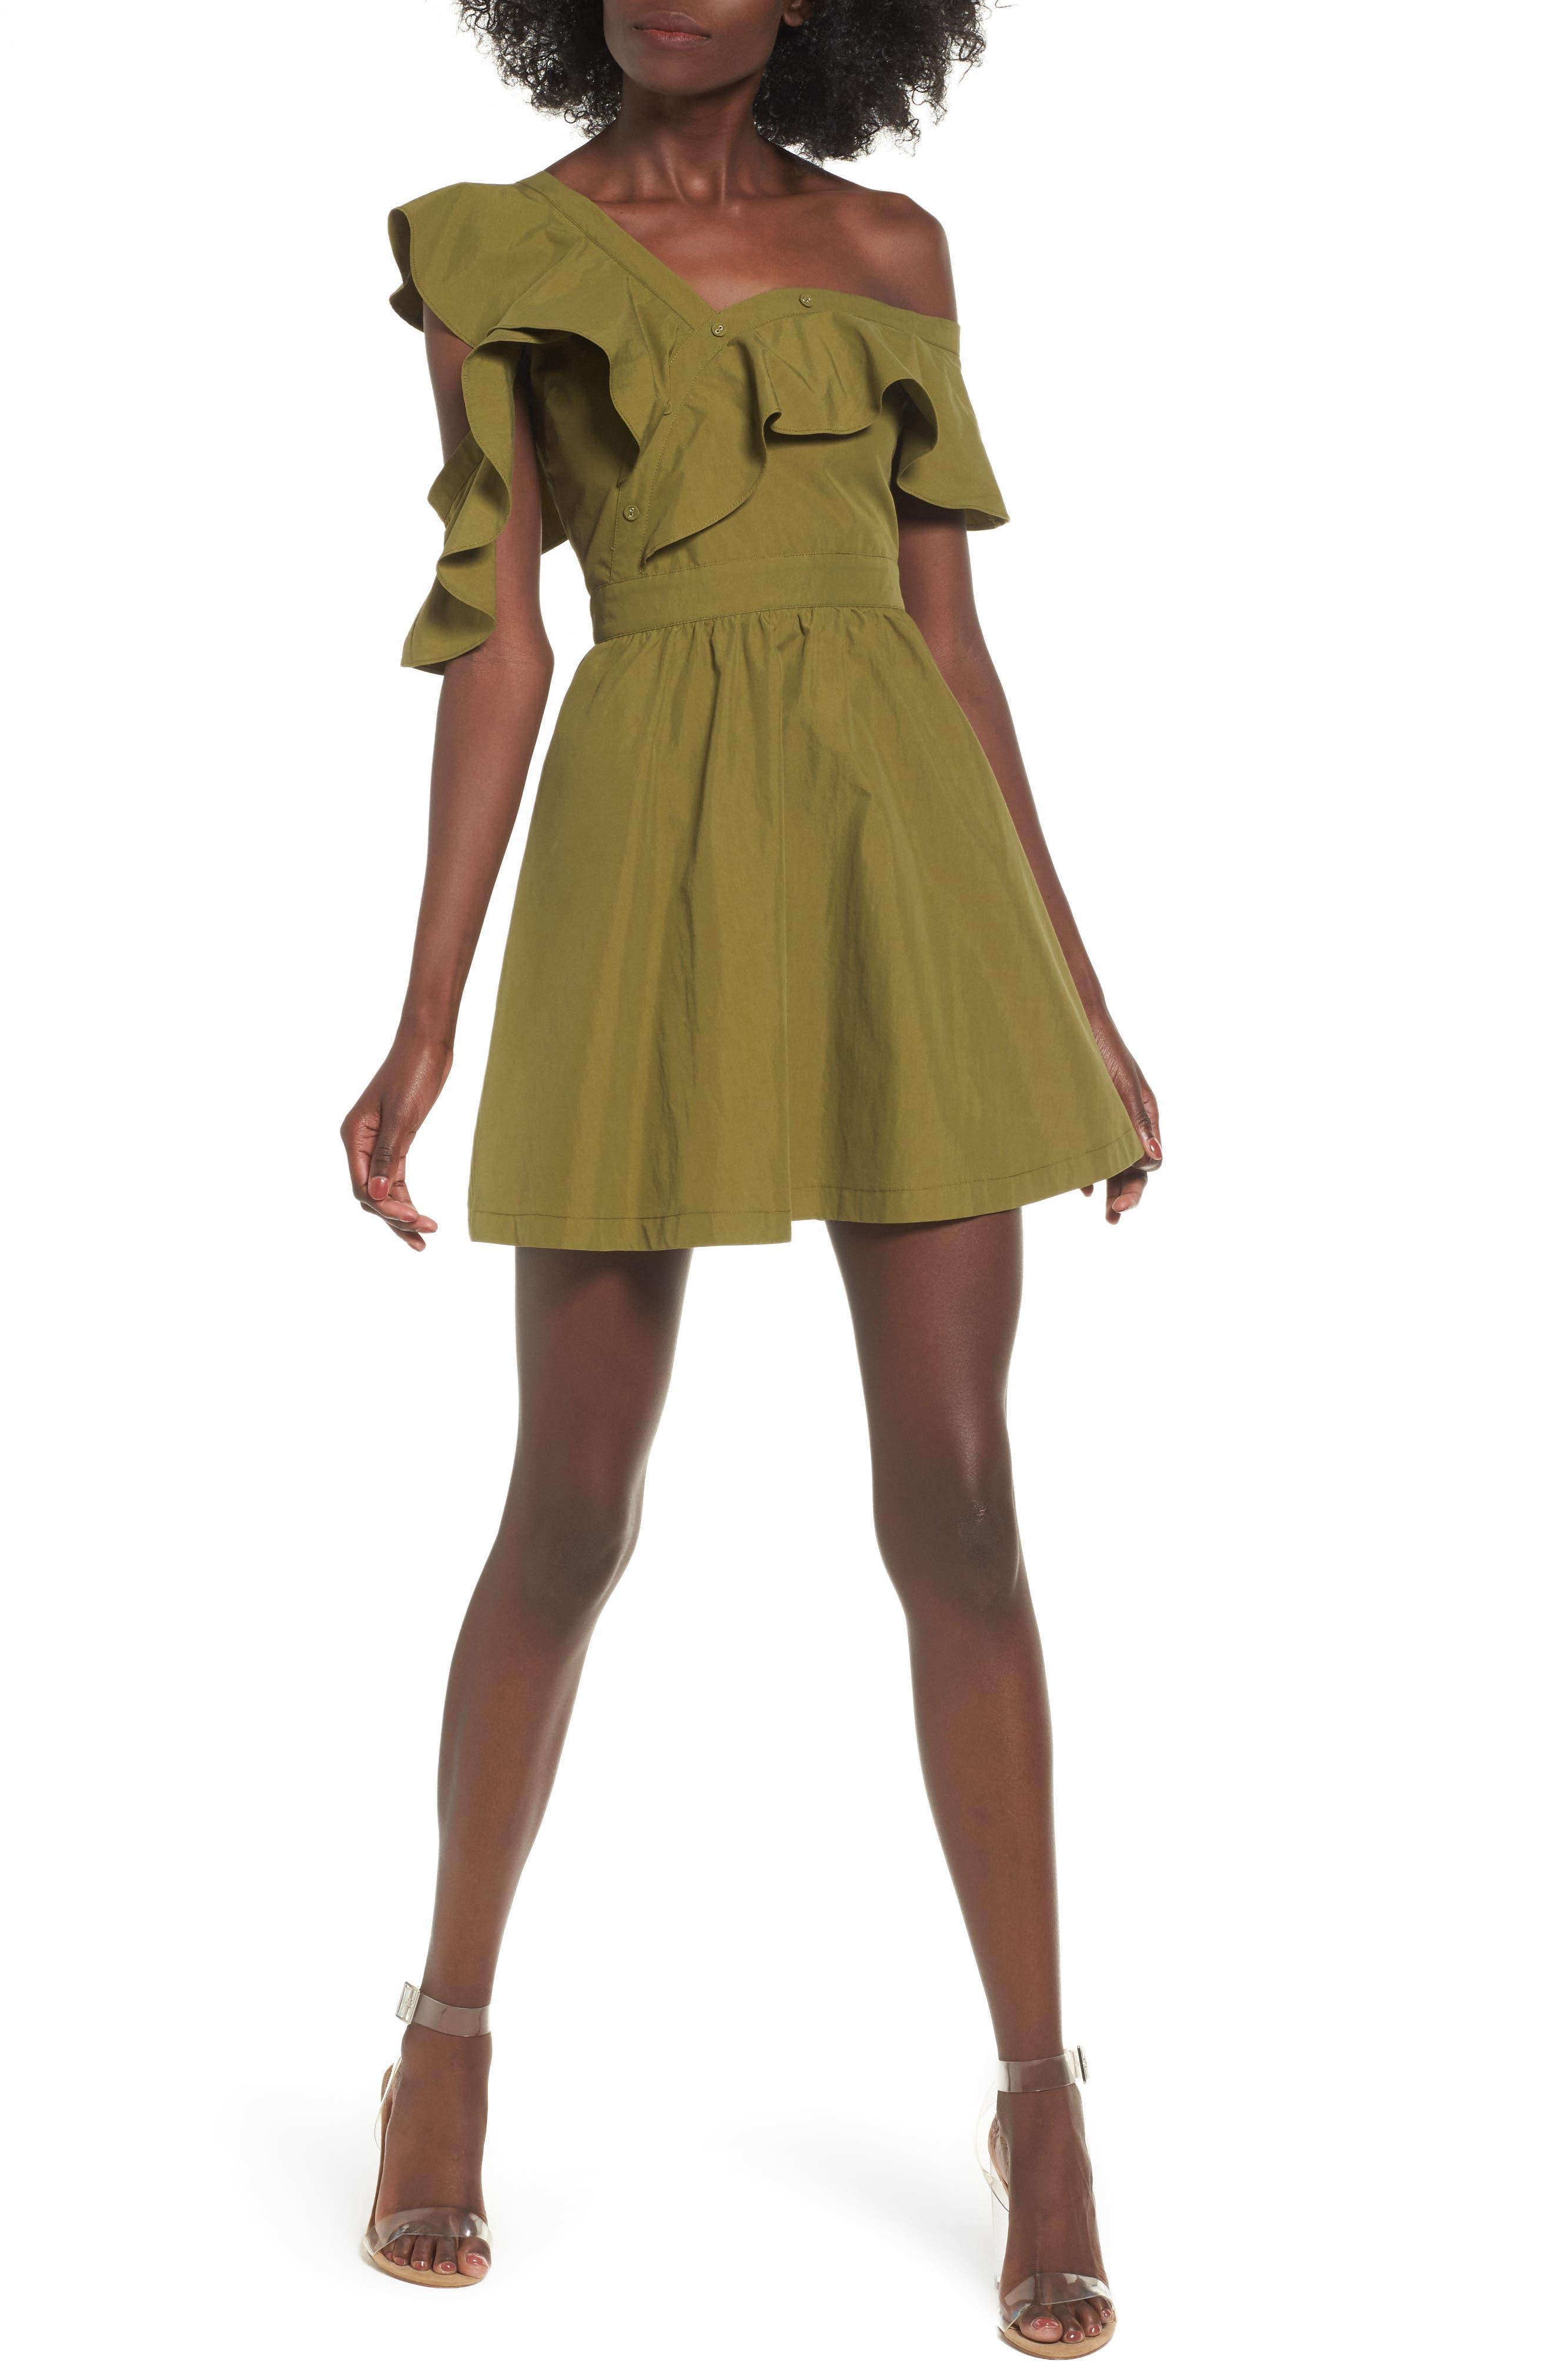 Alternate Image 1 Selected - J.O.A. Ruffle Dress